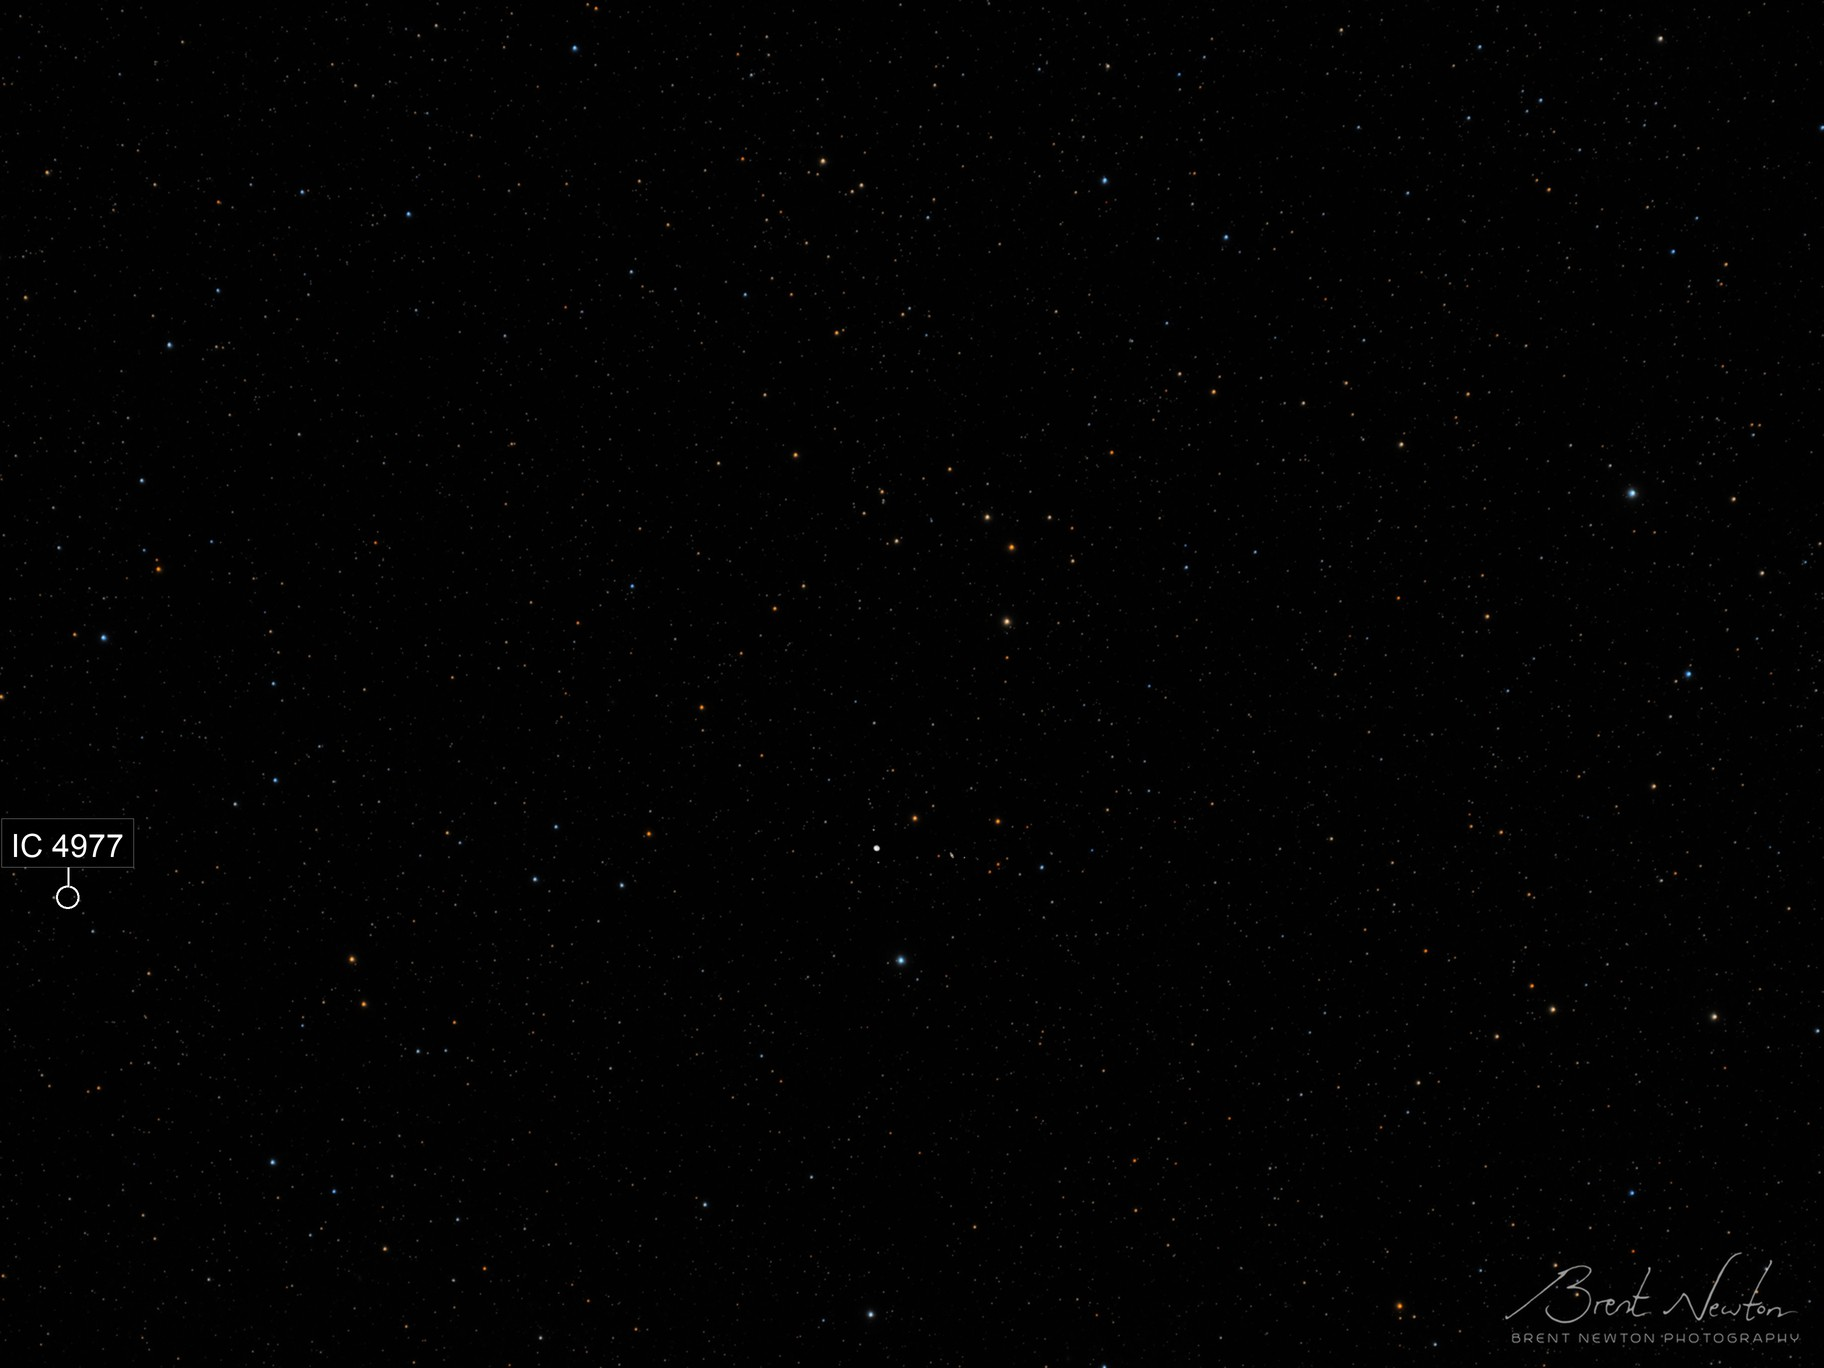 The Jupiter - Saturn Starfield